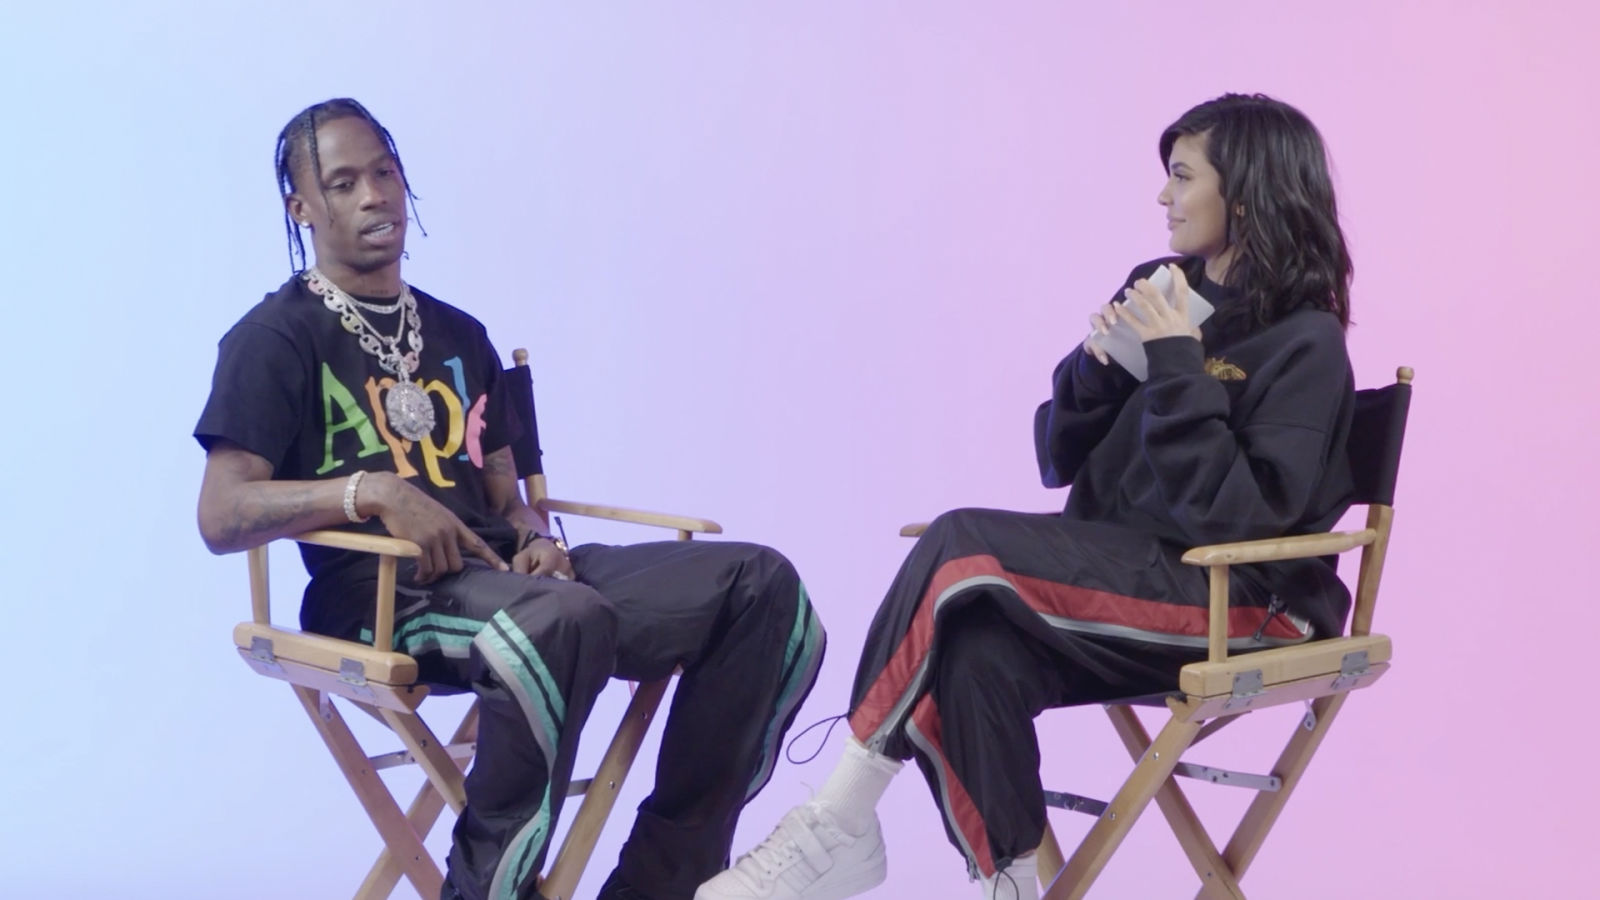 Kylie Jenner le hace 23 preguntas a Travis Scott